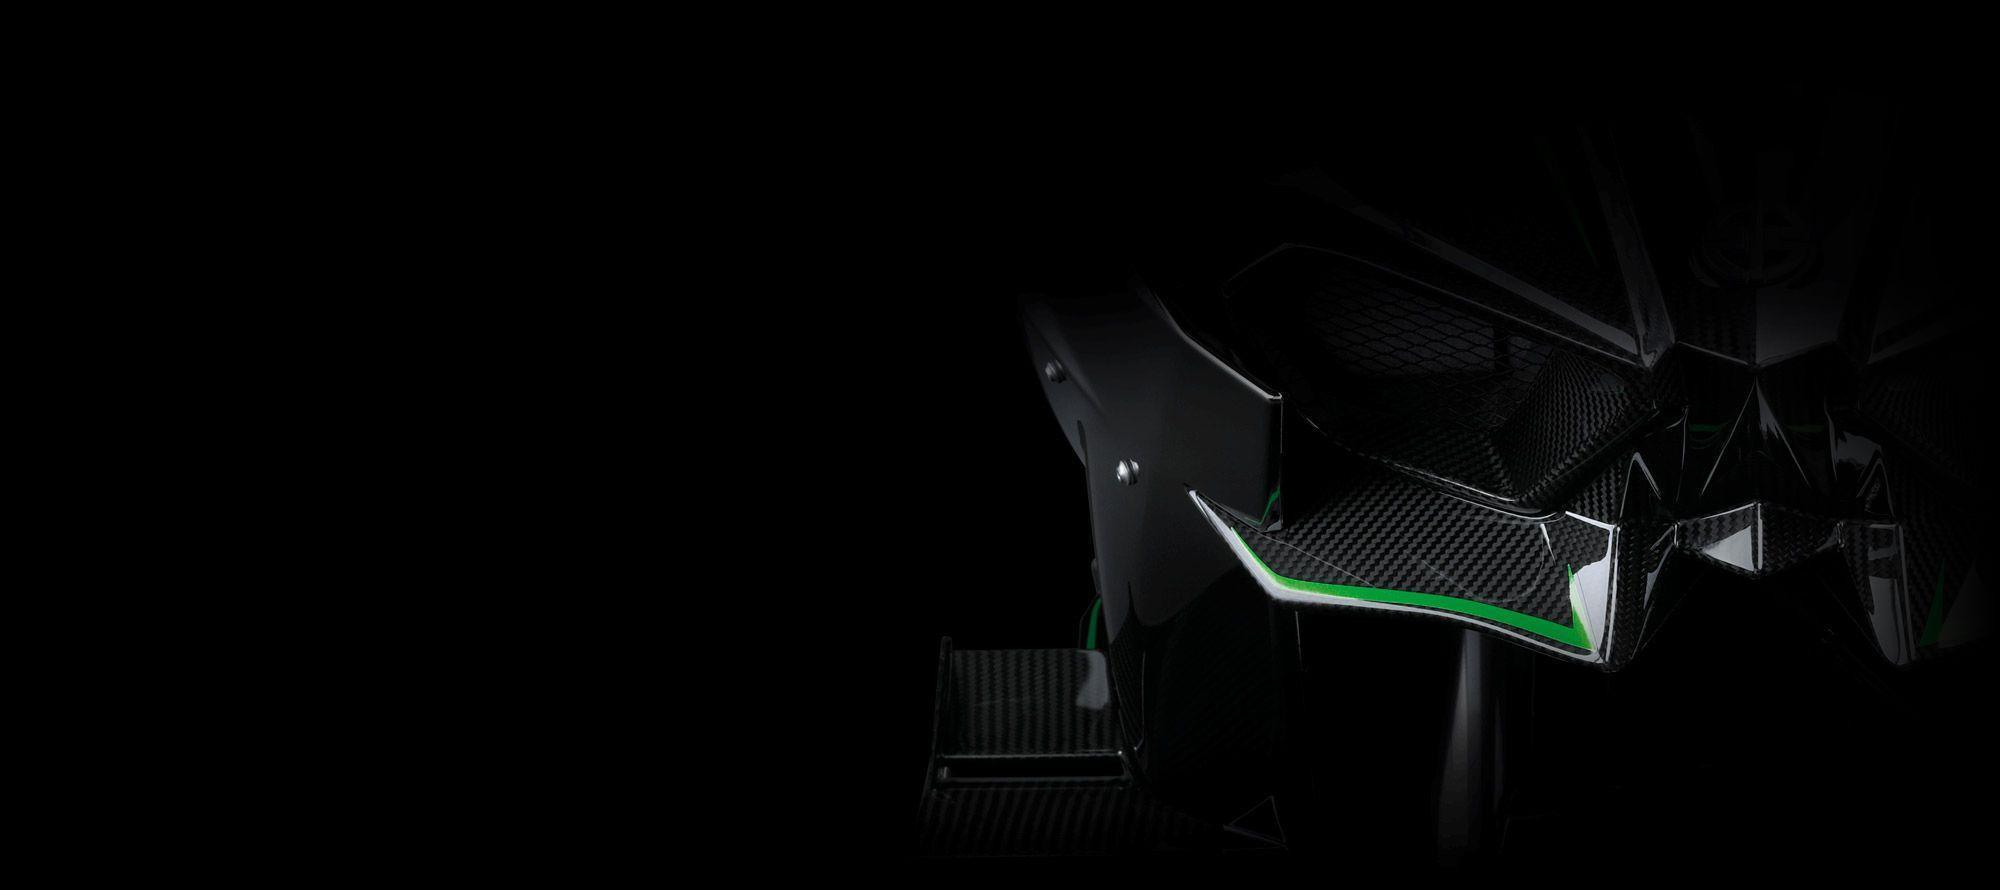 Kawasaki Ninja H2 and H2R Price Rumors Surface - autoevolution